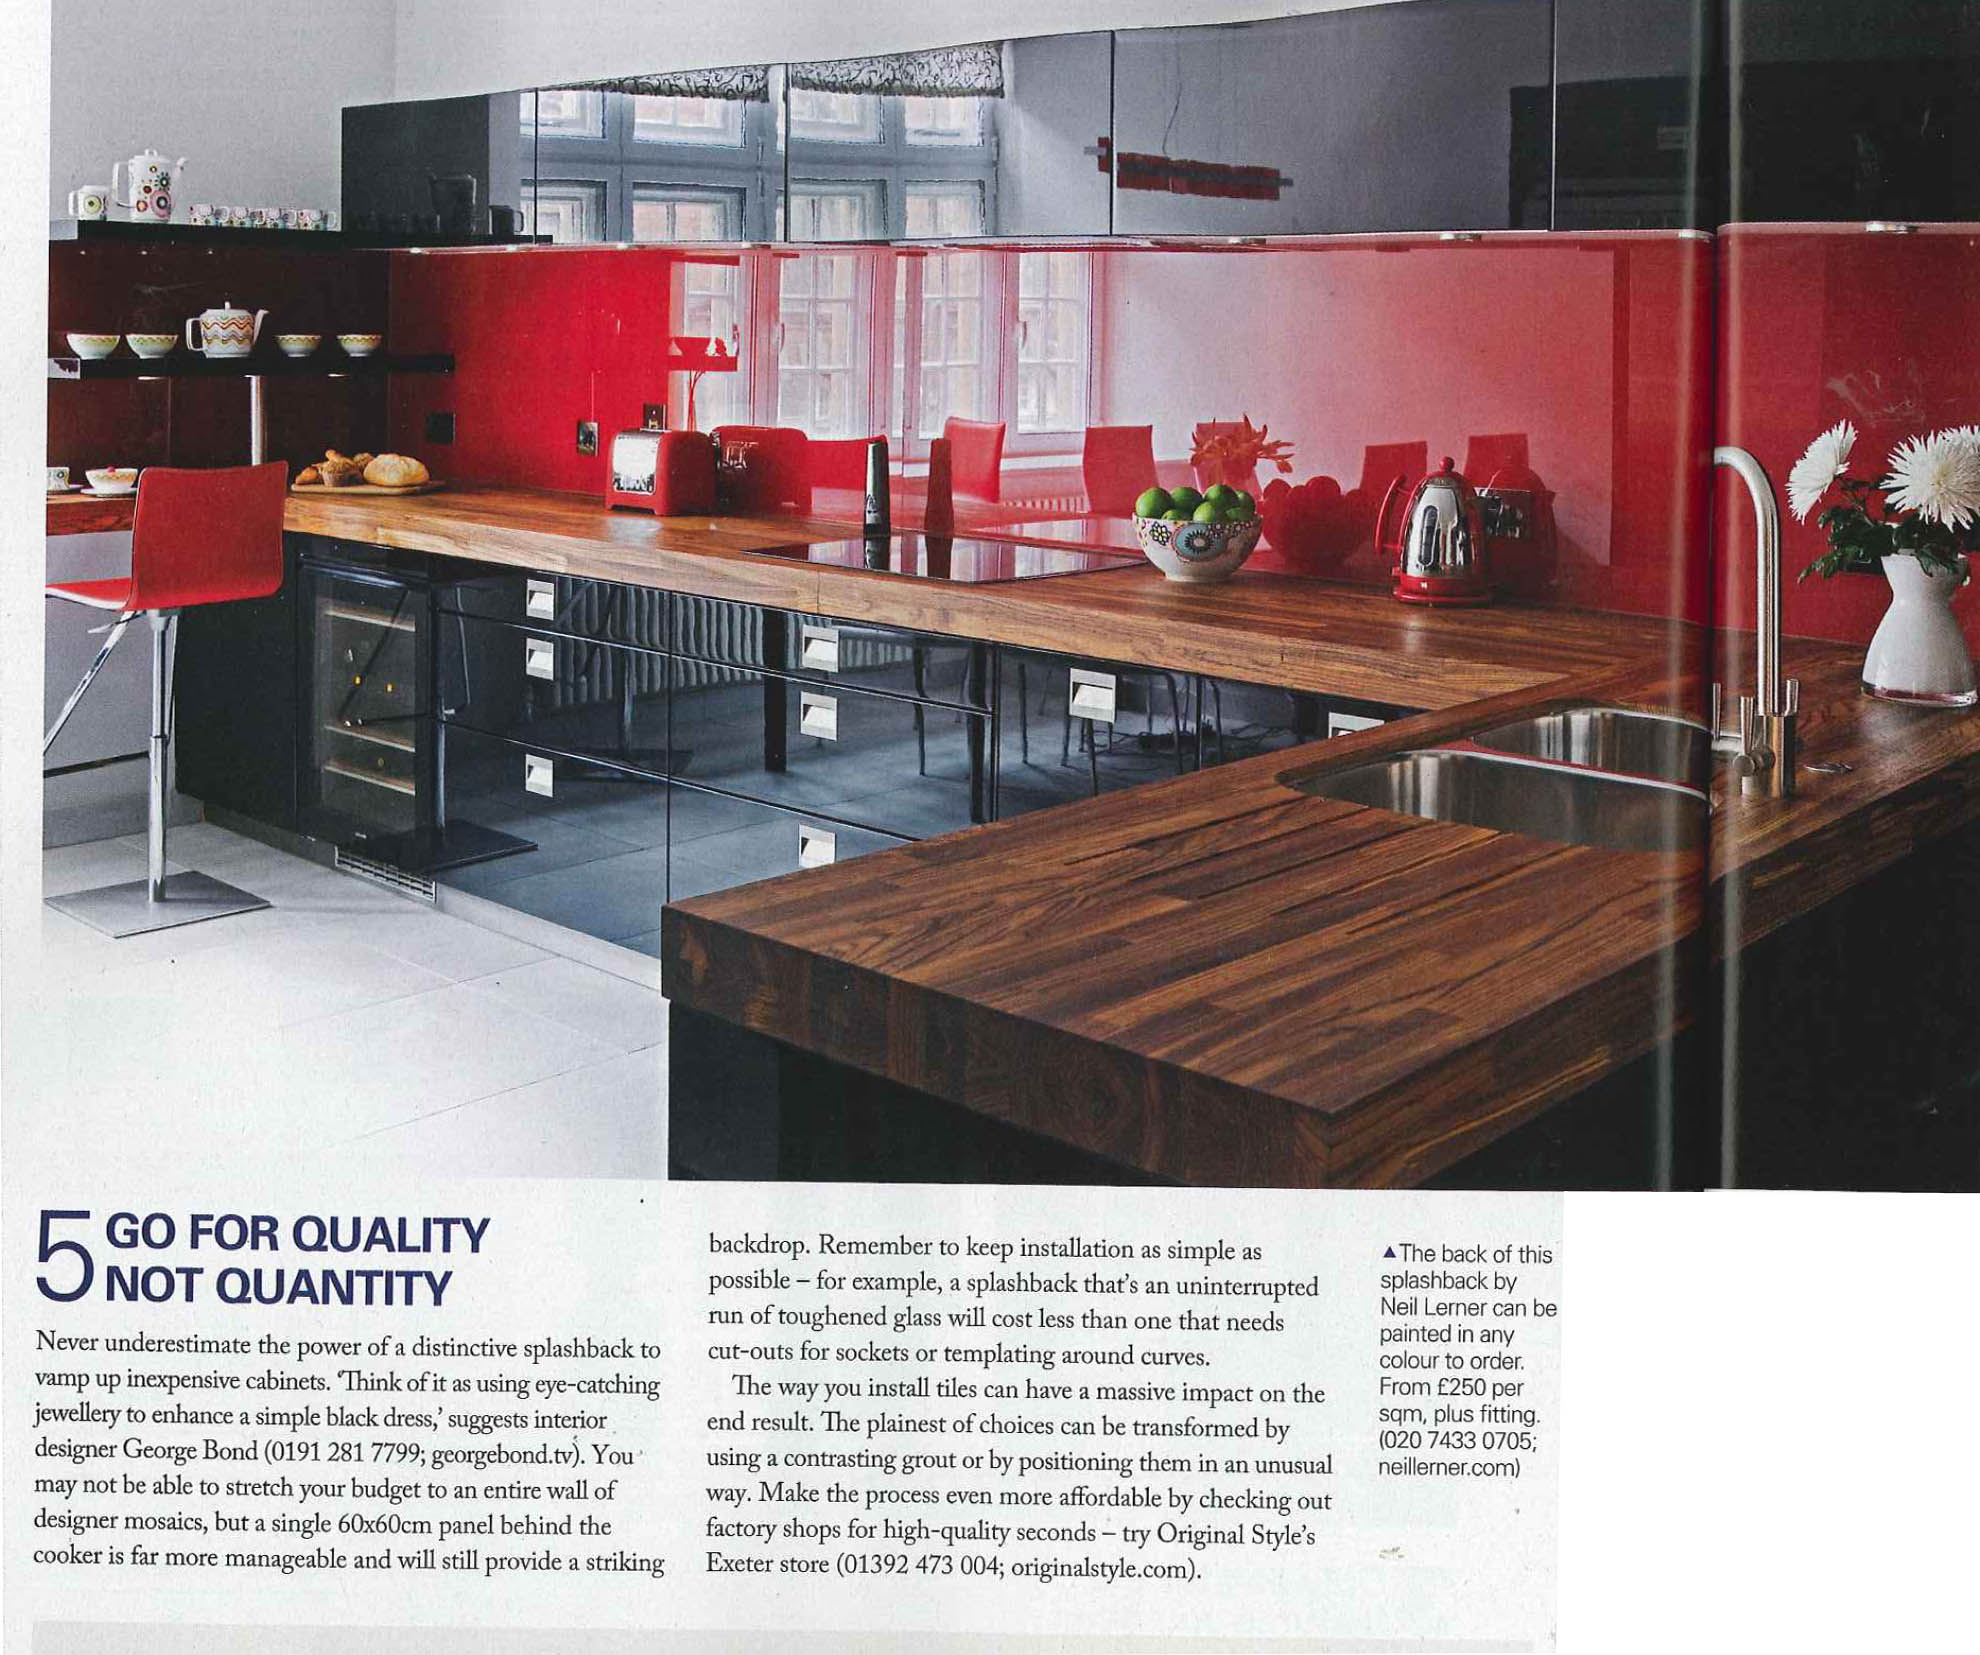 New Modern Kitchens At Neil Lerner: Add Some Flash With A Splash (back)